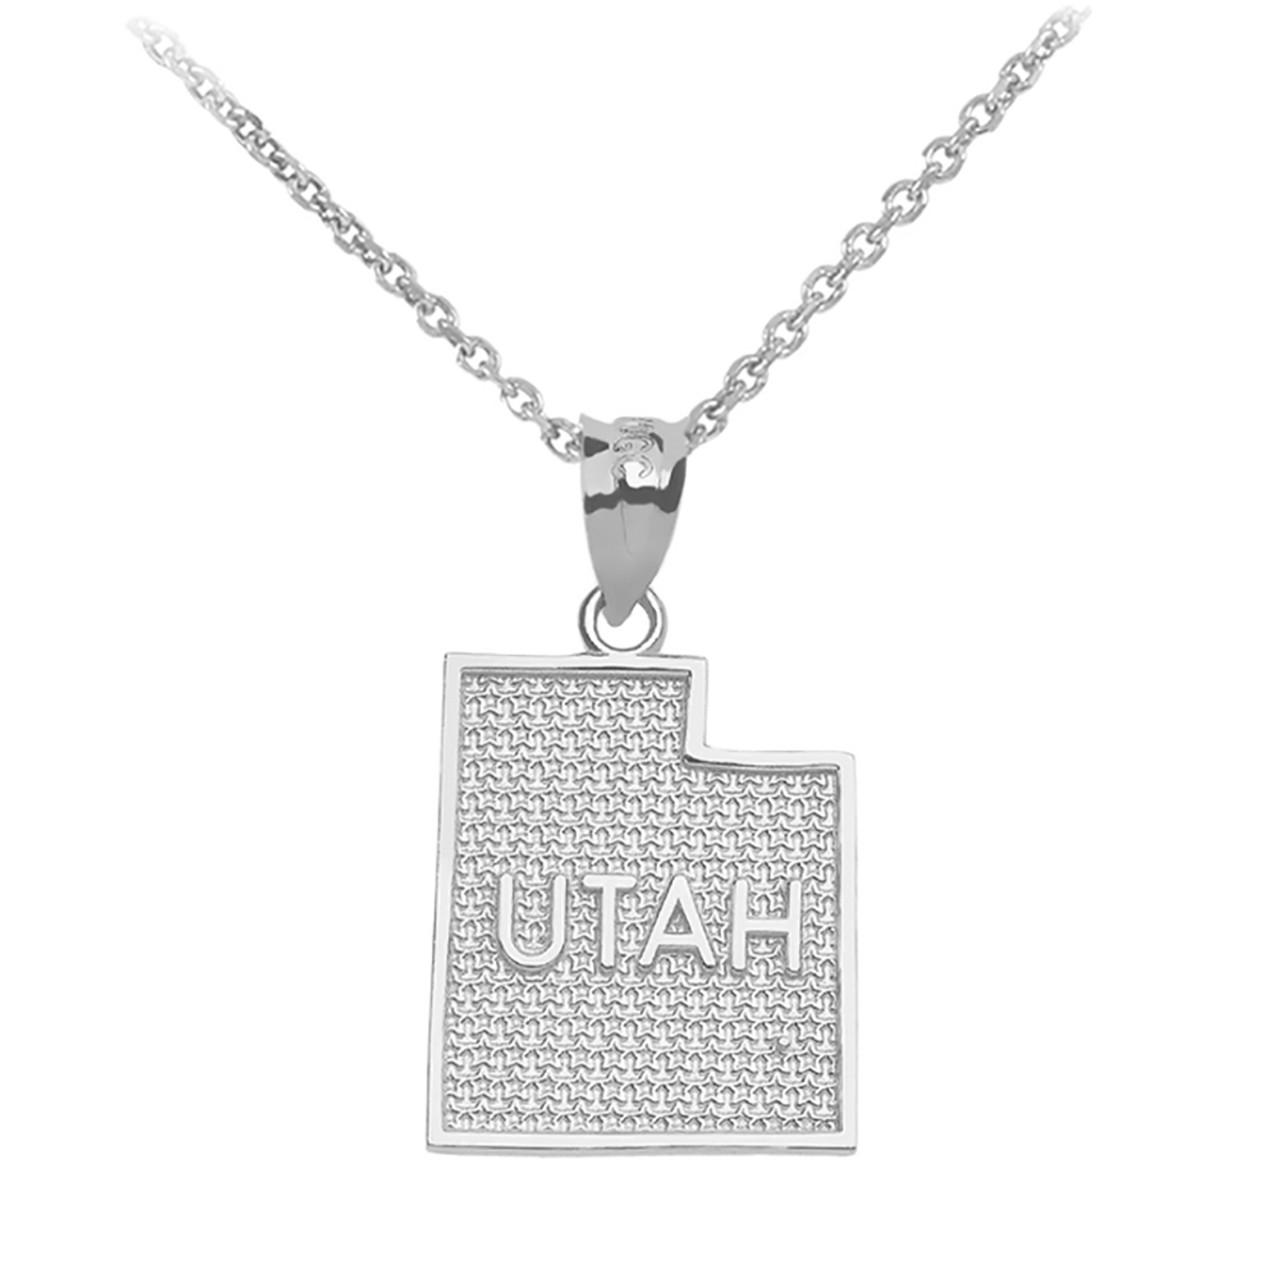 Utah State Necklace